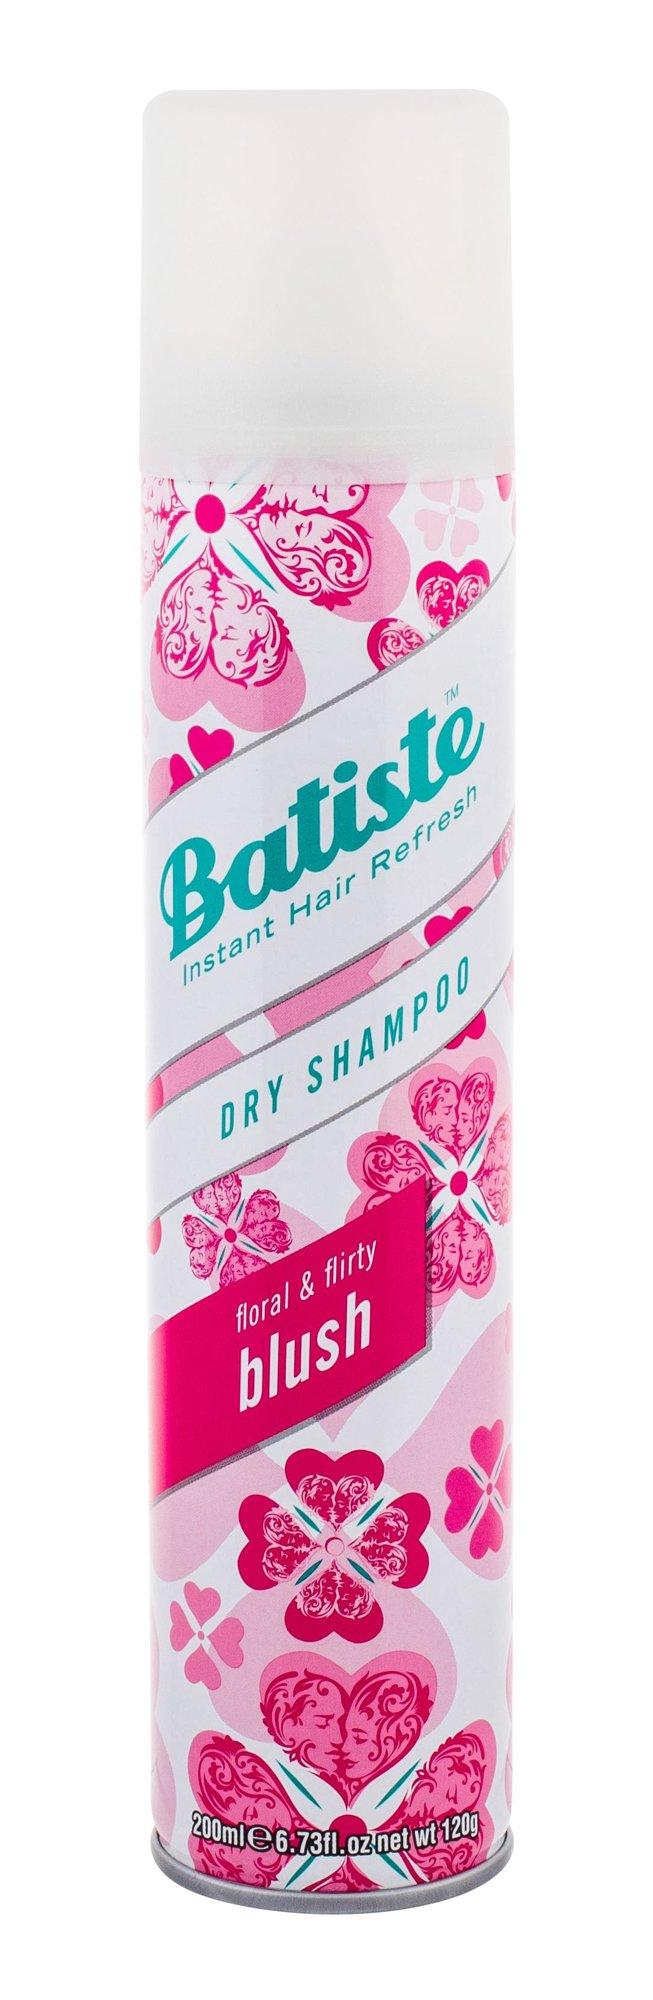 Batiste Blush Cosmetic 200ml